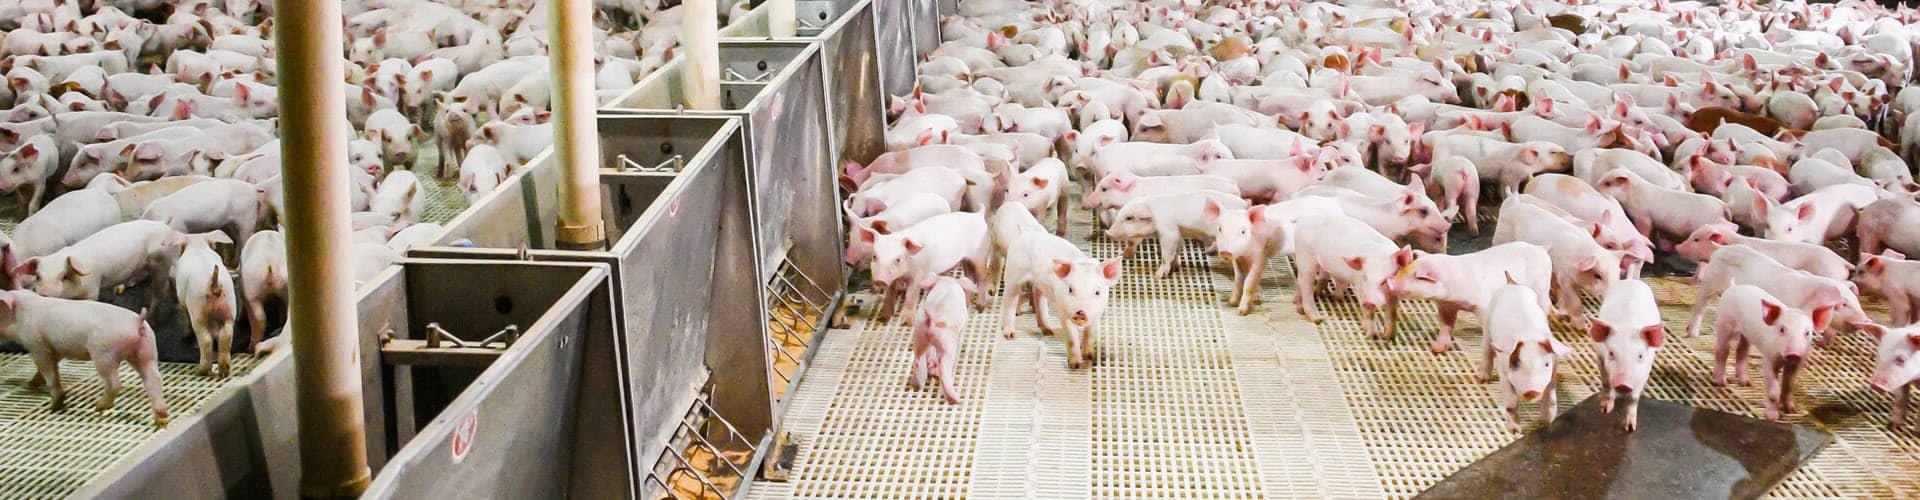 Swine Management Software | PigCHAMP com